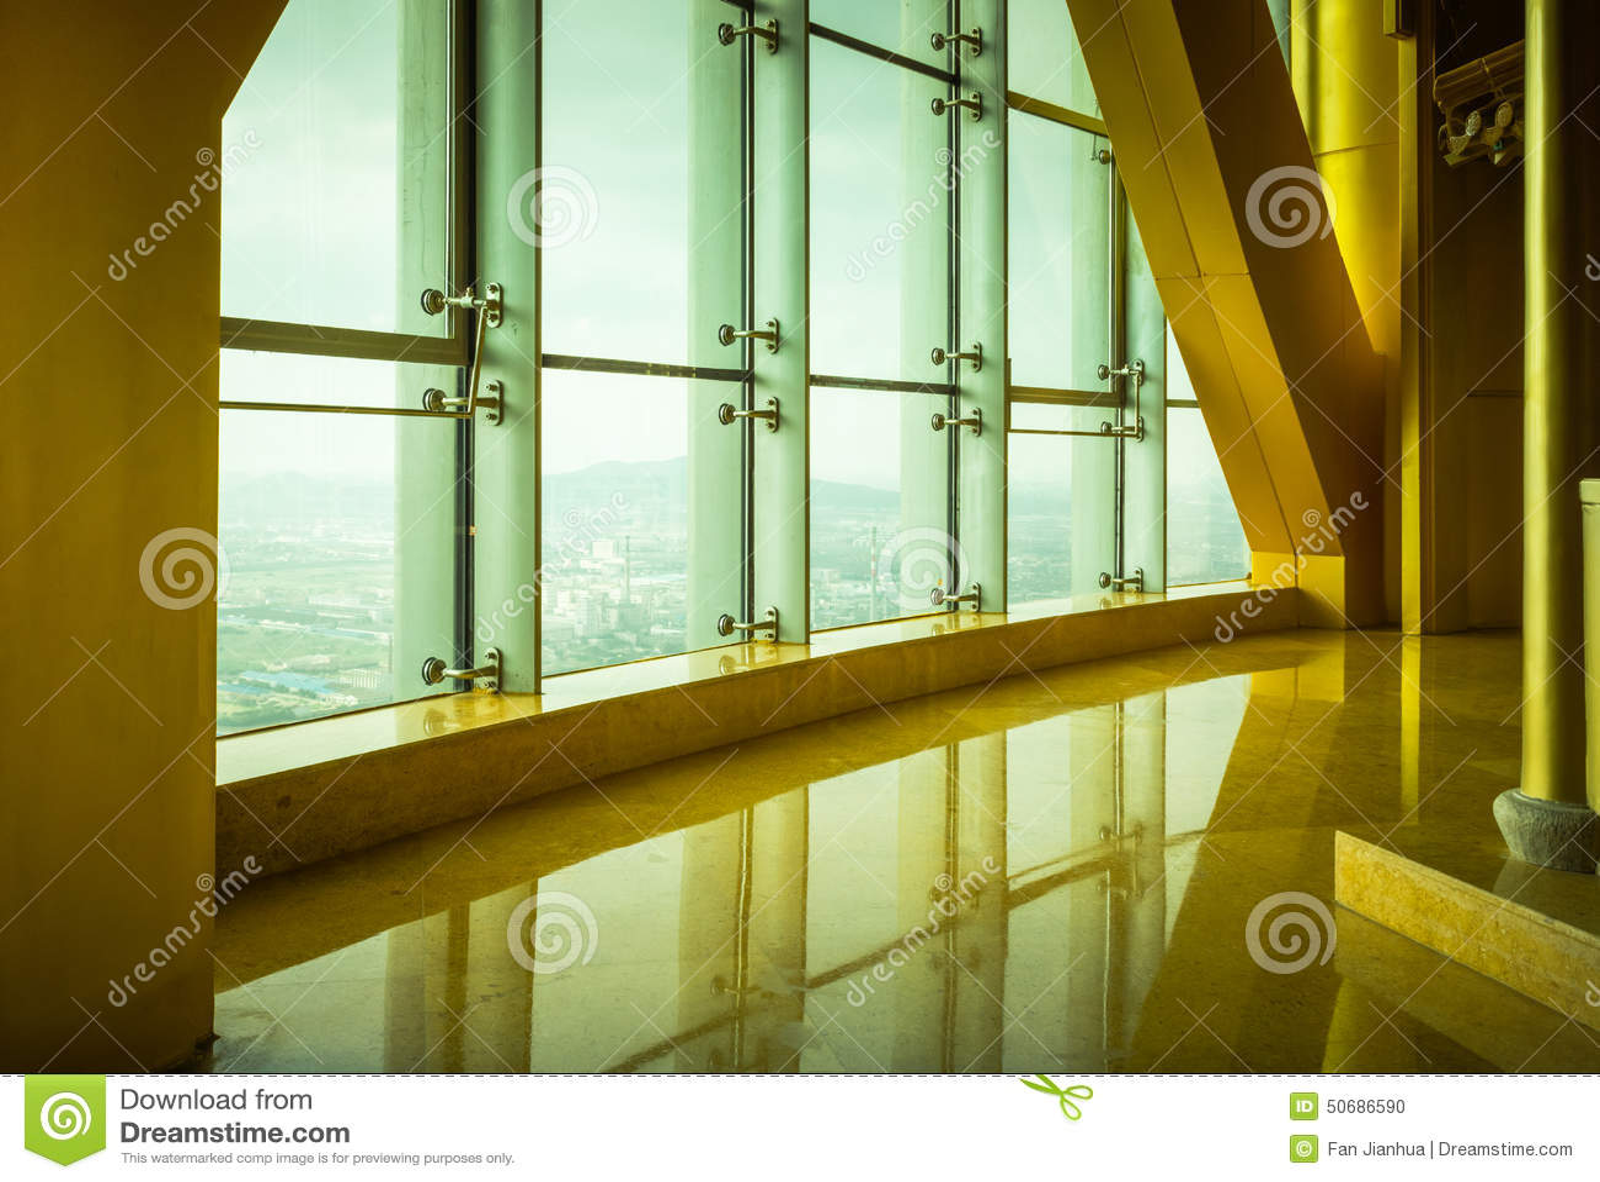 Download 现代大厦的内部结构 库存照片. 图片 包括有 豪华, 视窗, 查找, 弯曲, 柱子, 布琼布拉, 螺丝, 的treadled - 50686590